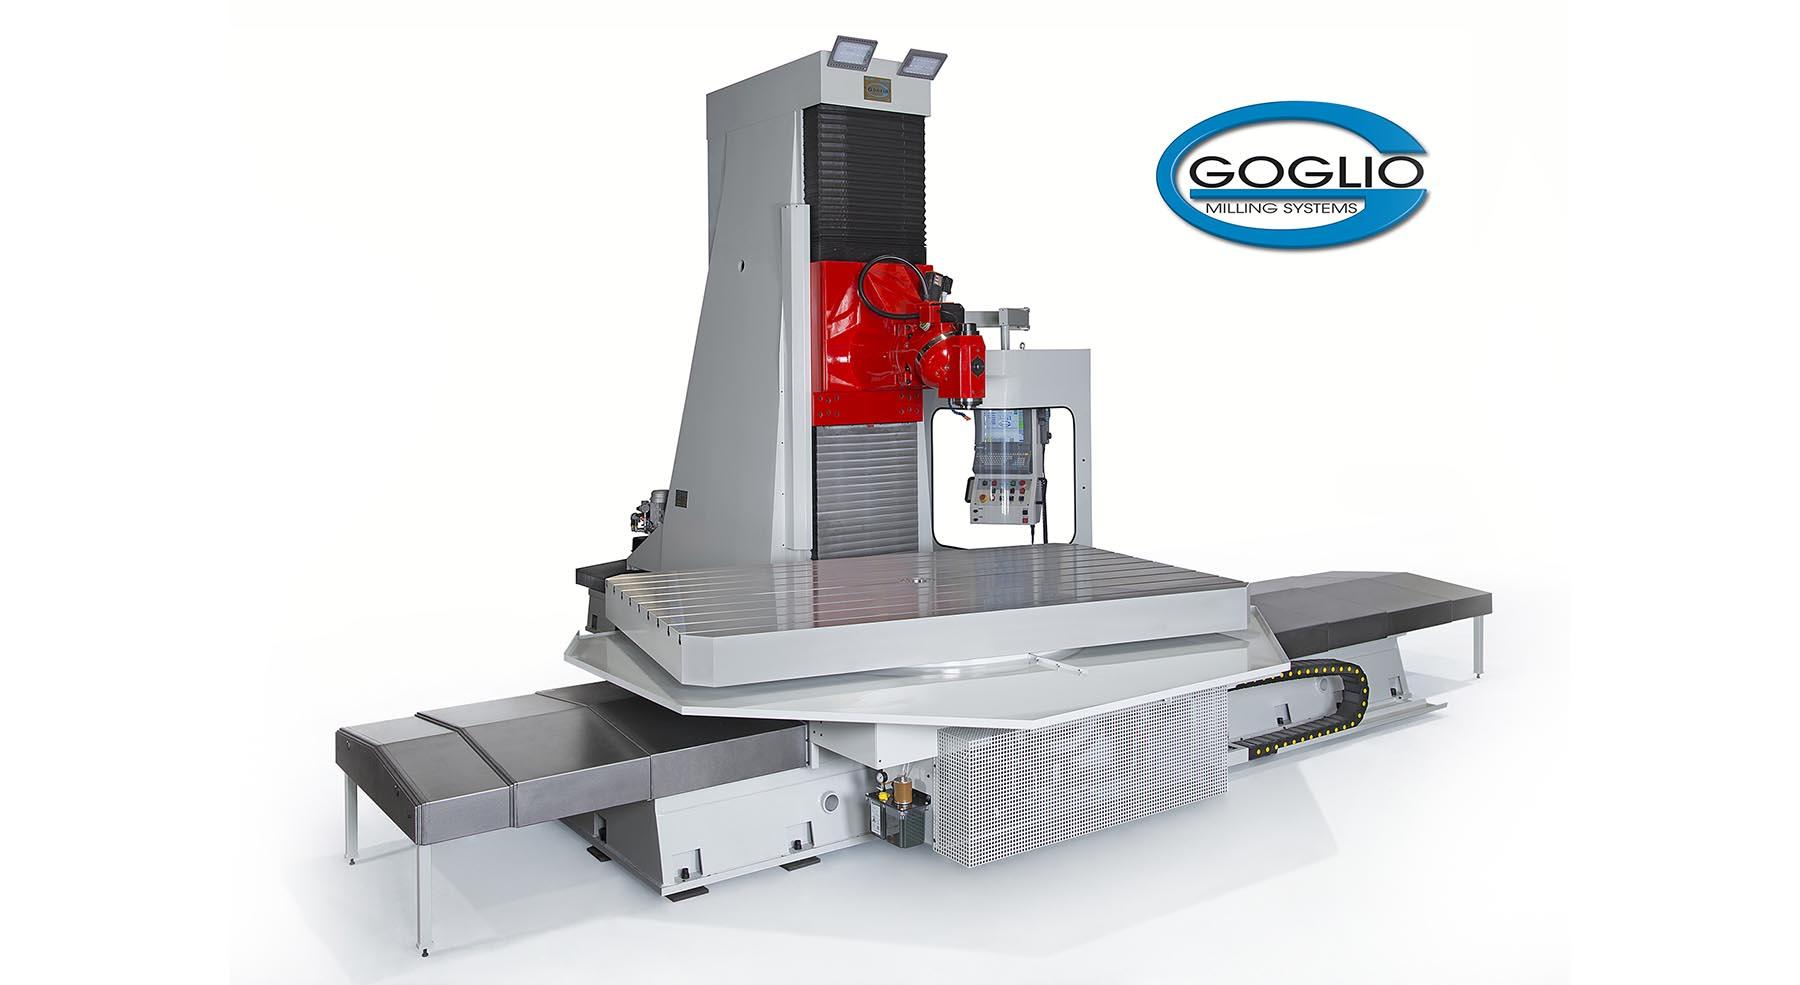 Goglio Milling System